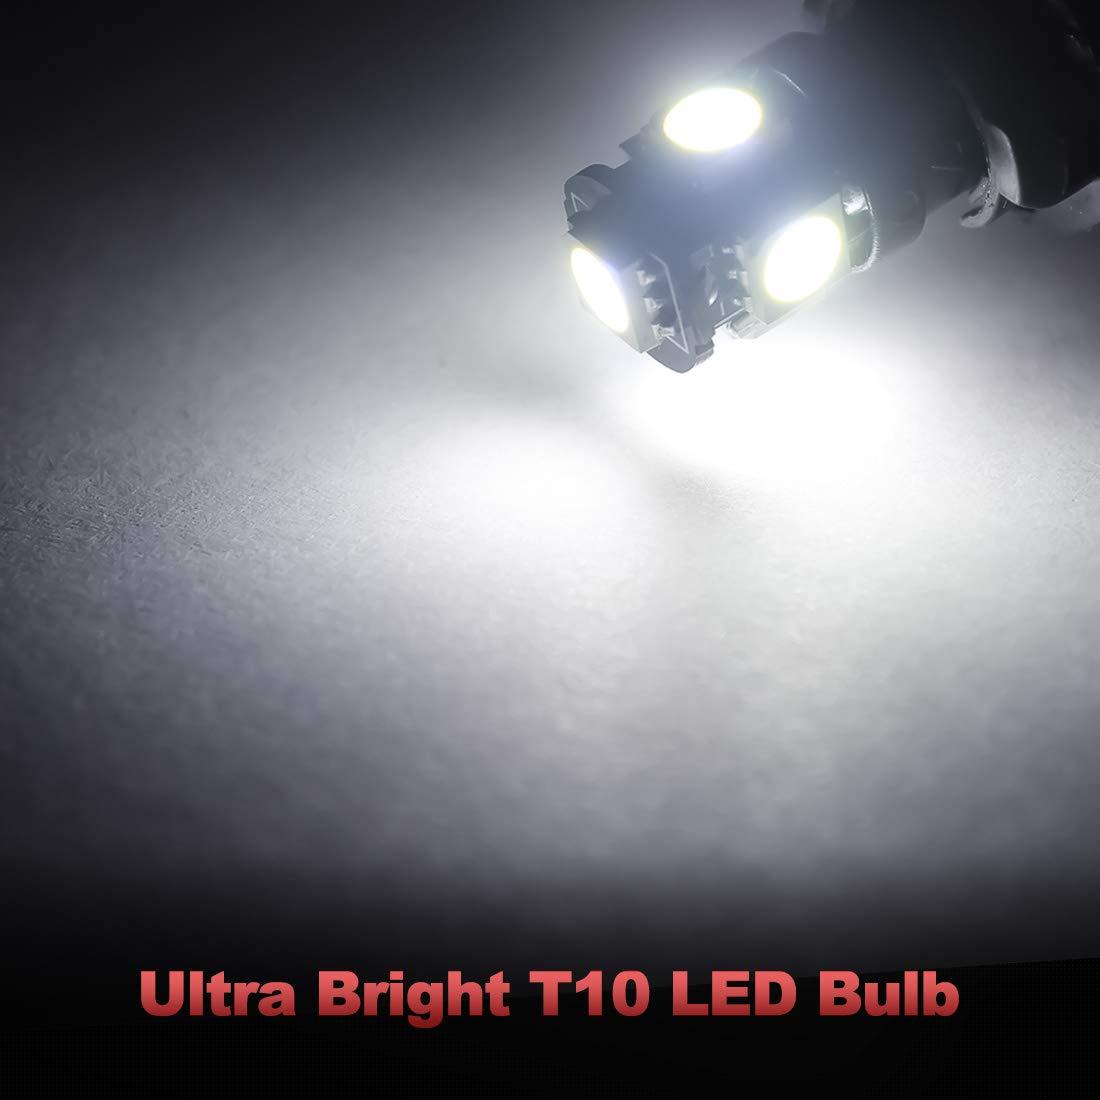 3175 LED Bulbs Yorkim 31mm Festoon LED Bulbs White Super Bright LED Interior Car Lights Error Free CANBUS 6-SMD 5730 Chipsets DE3022 LED DE3175 LED Bulb Pack of 4